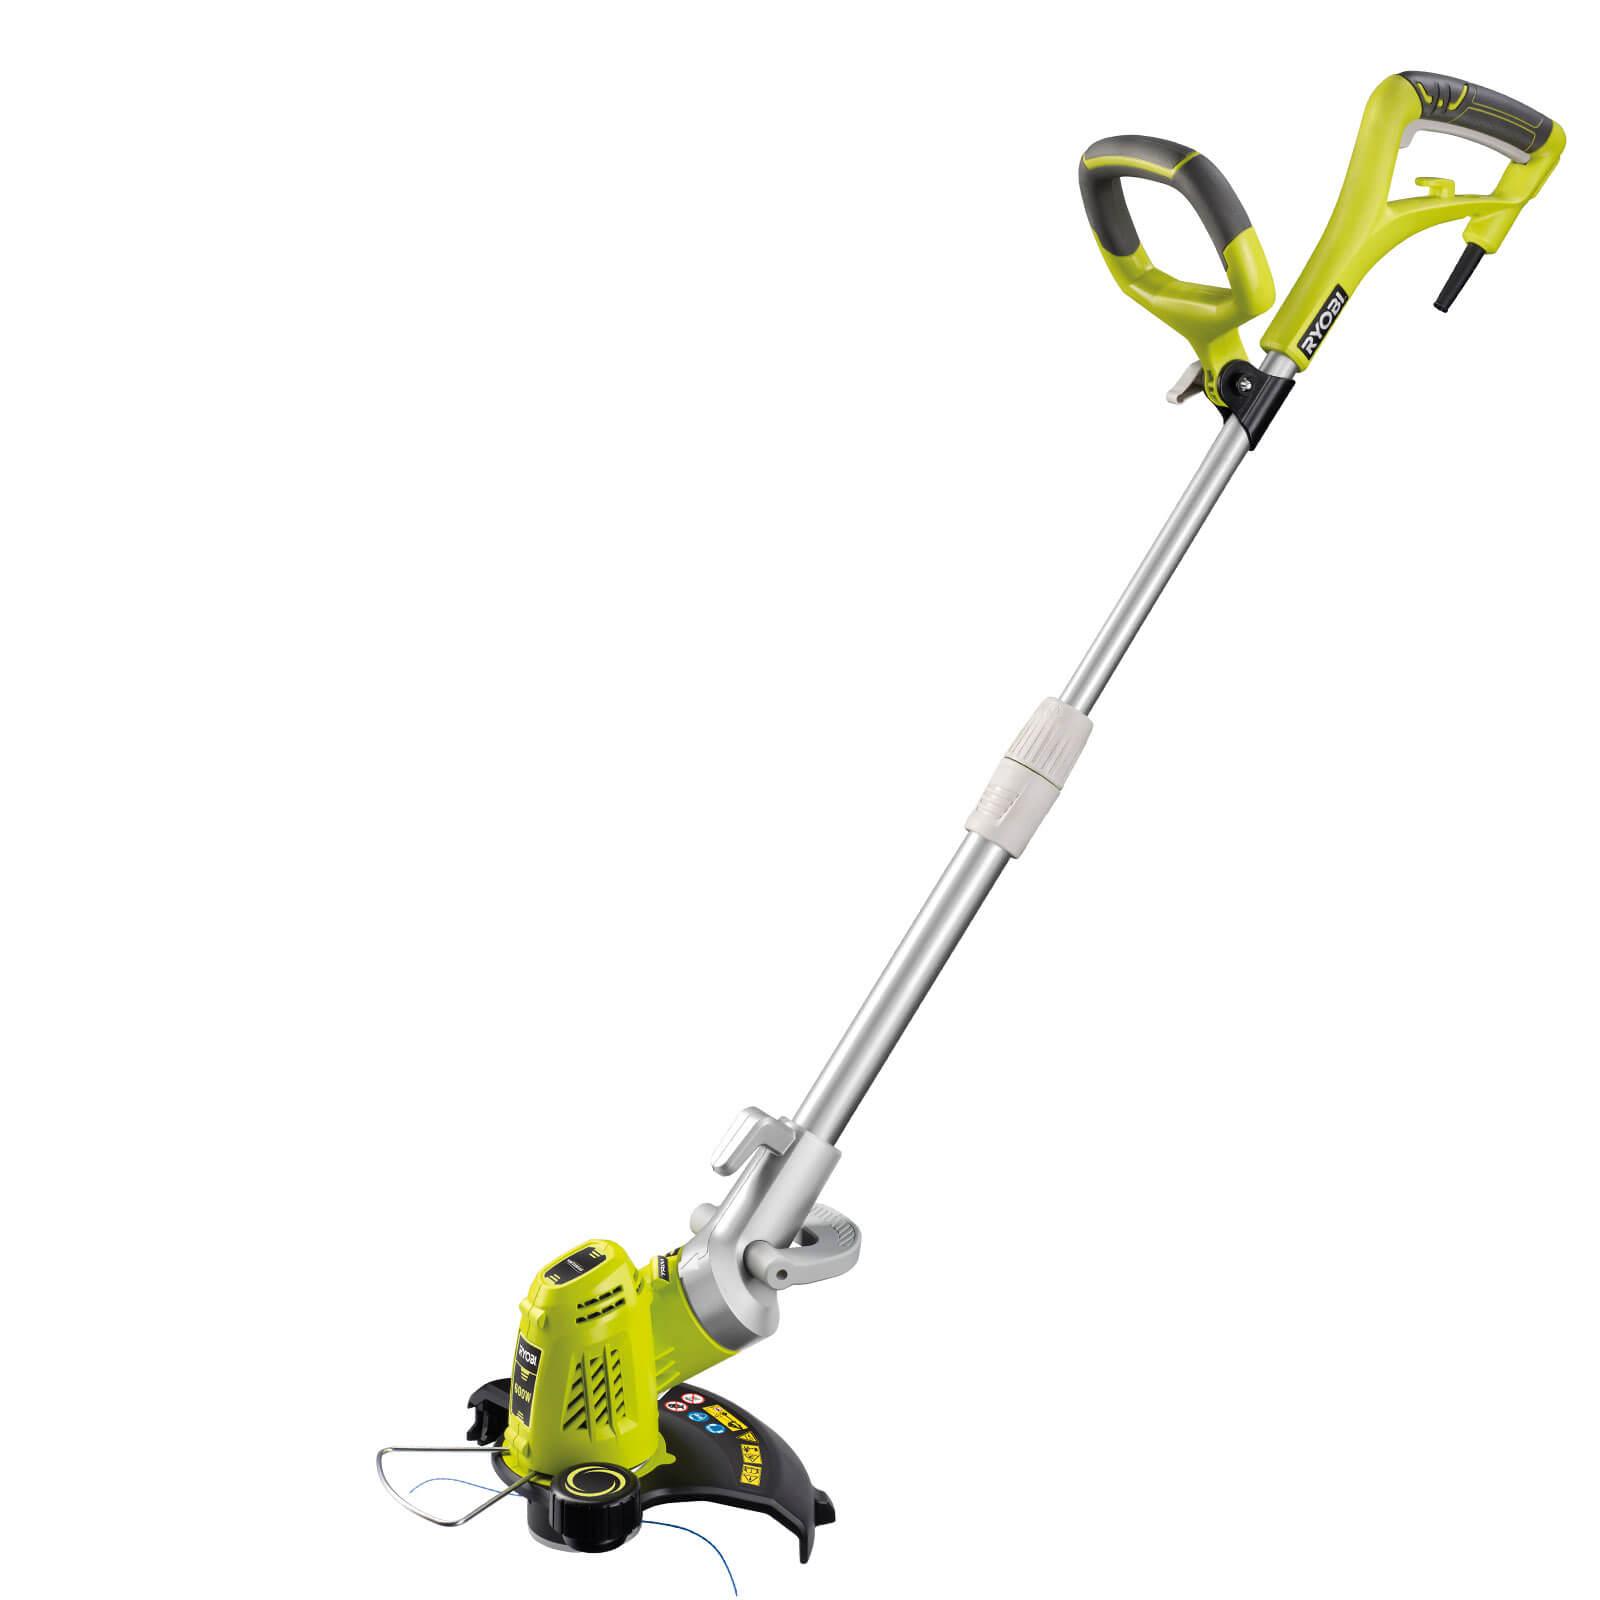 Ryobi RLT6030 Electric Grass Trimmer & Edger 300mm Cut Width 600w 240v